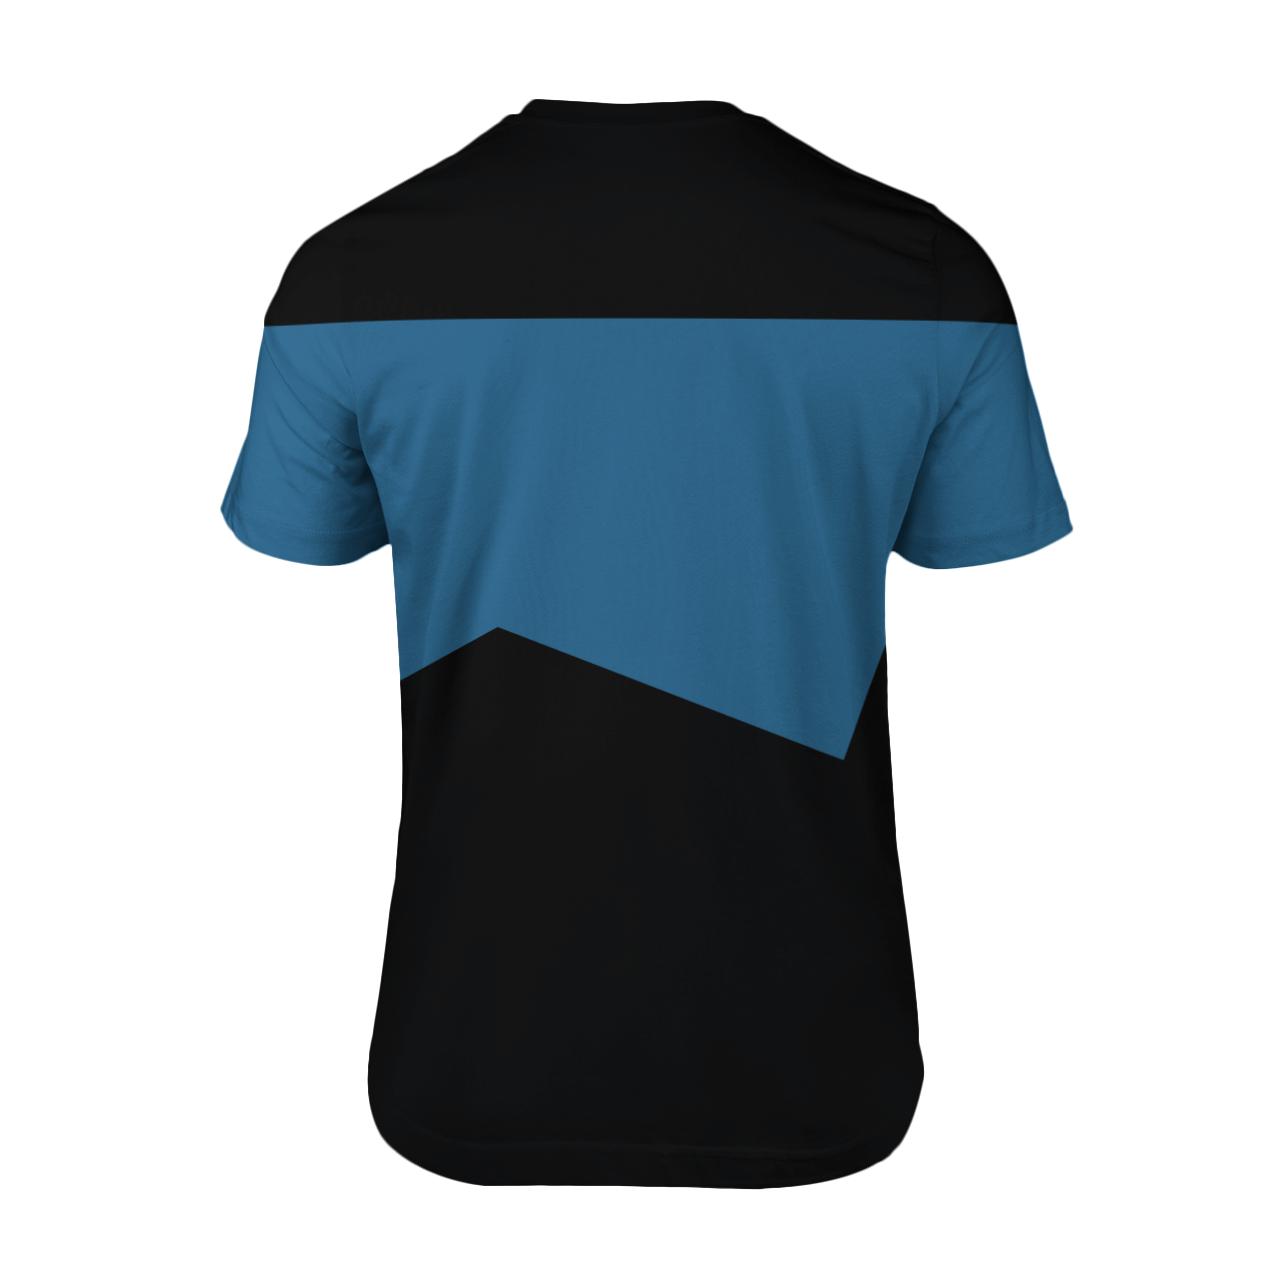 Star Trek science 3d shirt 2